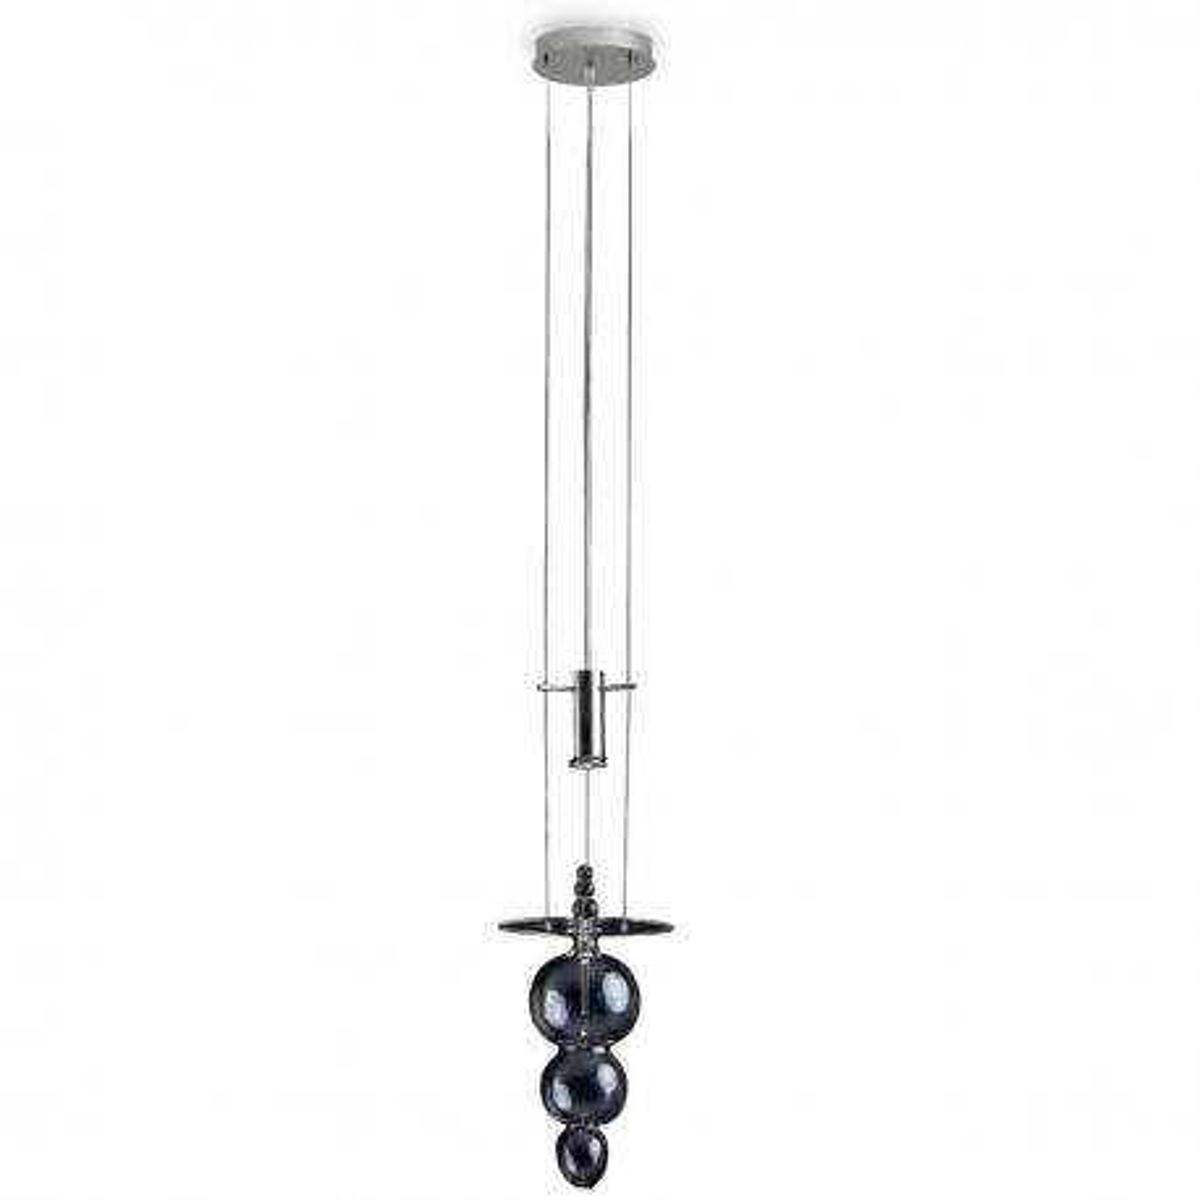 """Bulbo"" suspension en verre de Murano - 1 lumière - transparent"